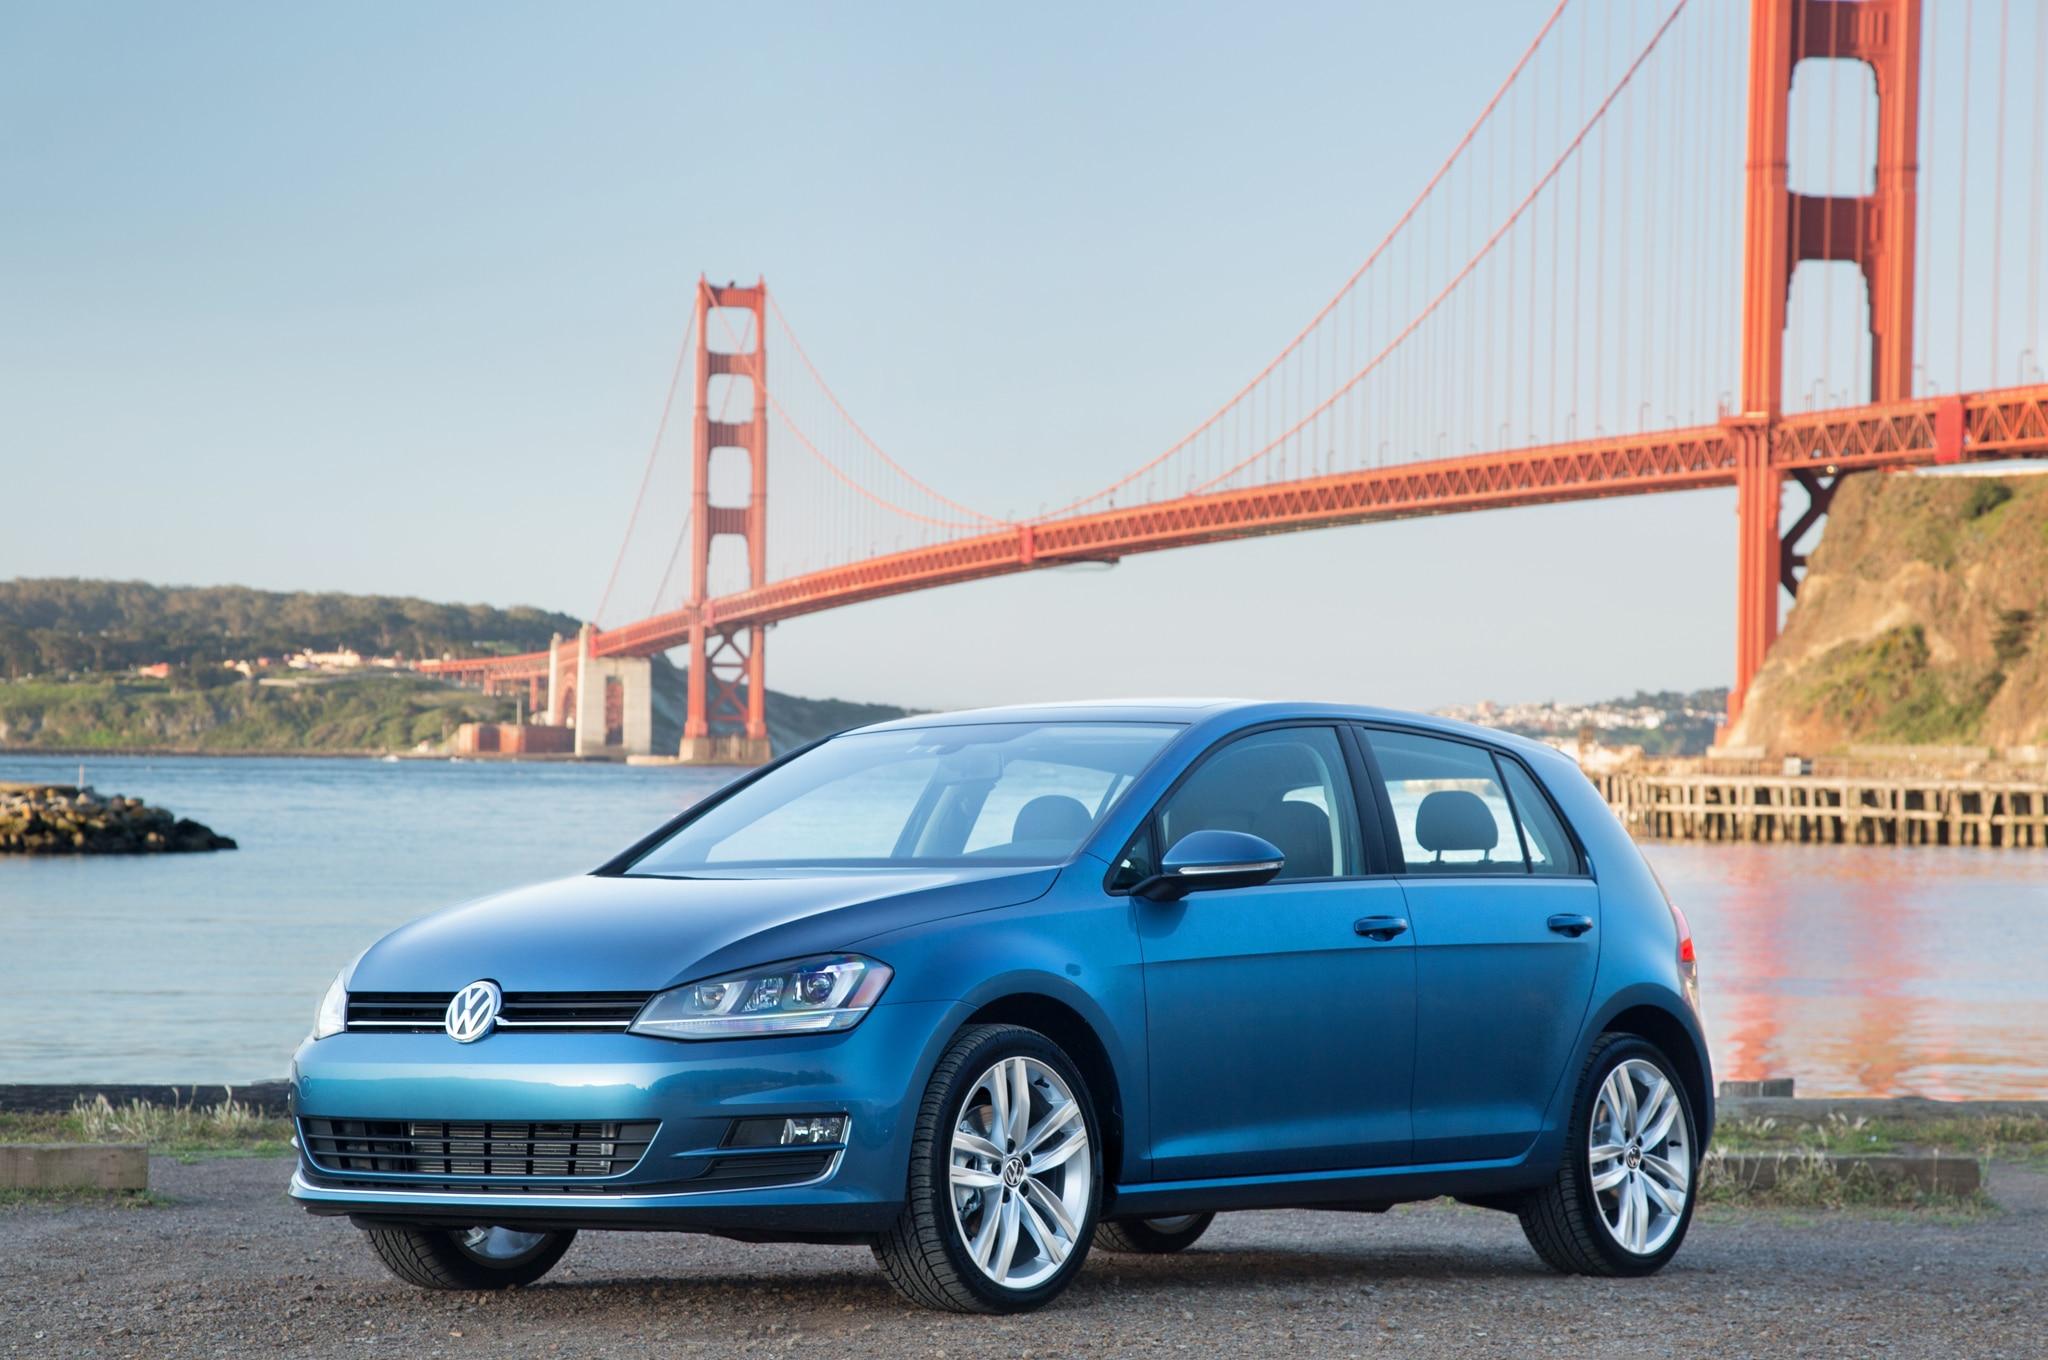 2015 Volkswagen Golf GTI, Golf Recalled for Steering Malfunction